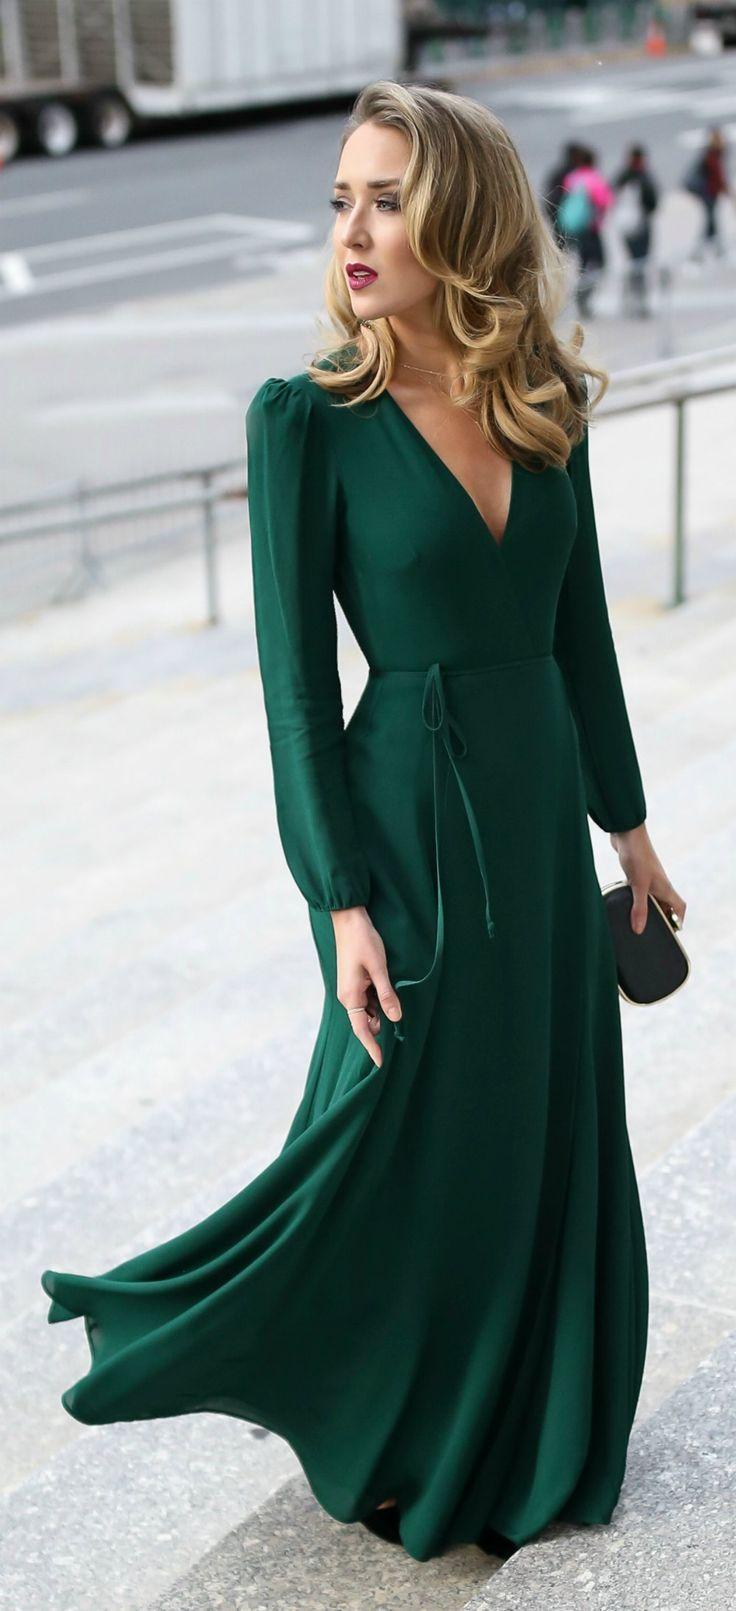 30 Dresses In 30 Days Black Tie Wedding Guest Emerald Green Long Sleeve Floor Length Wrap Dres Green Wedding Dresses Black Tie Wedding Guests Guest Dresses [ 1611 x 736 Pixel ]